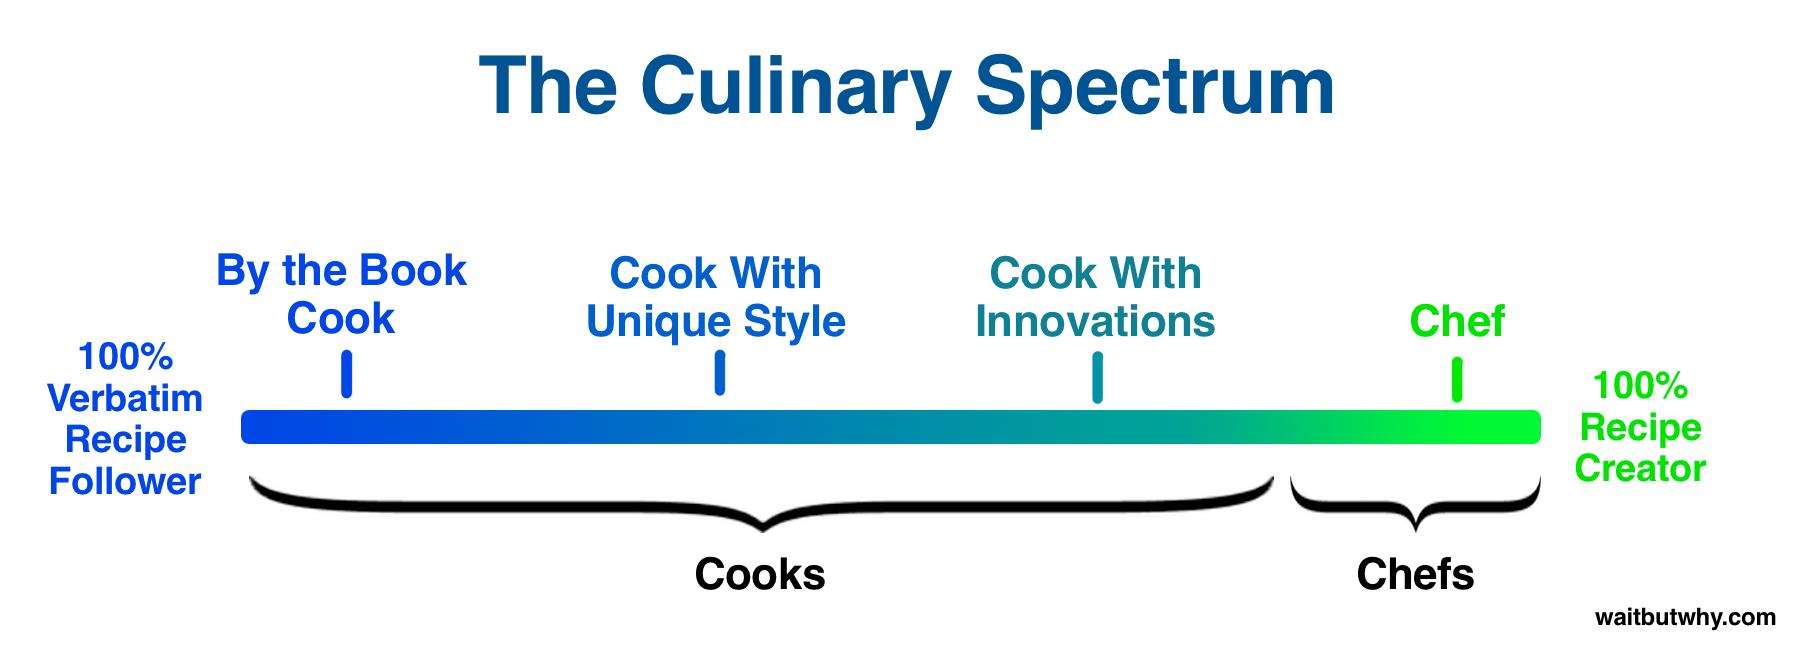 Chef-Cook Spectrum